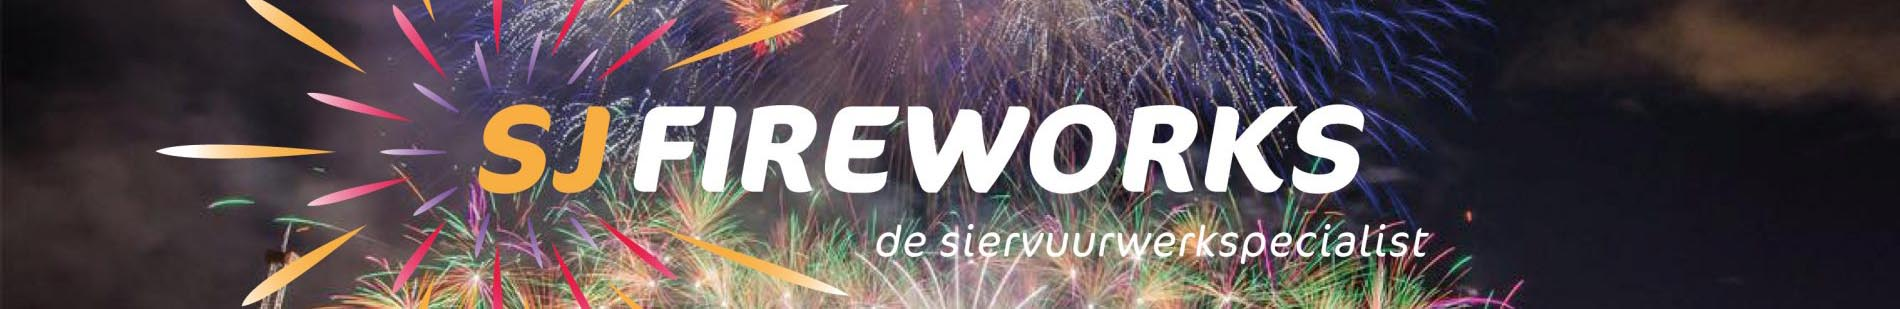 SJ Fireworks siervuurwerk